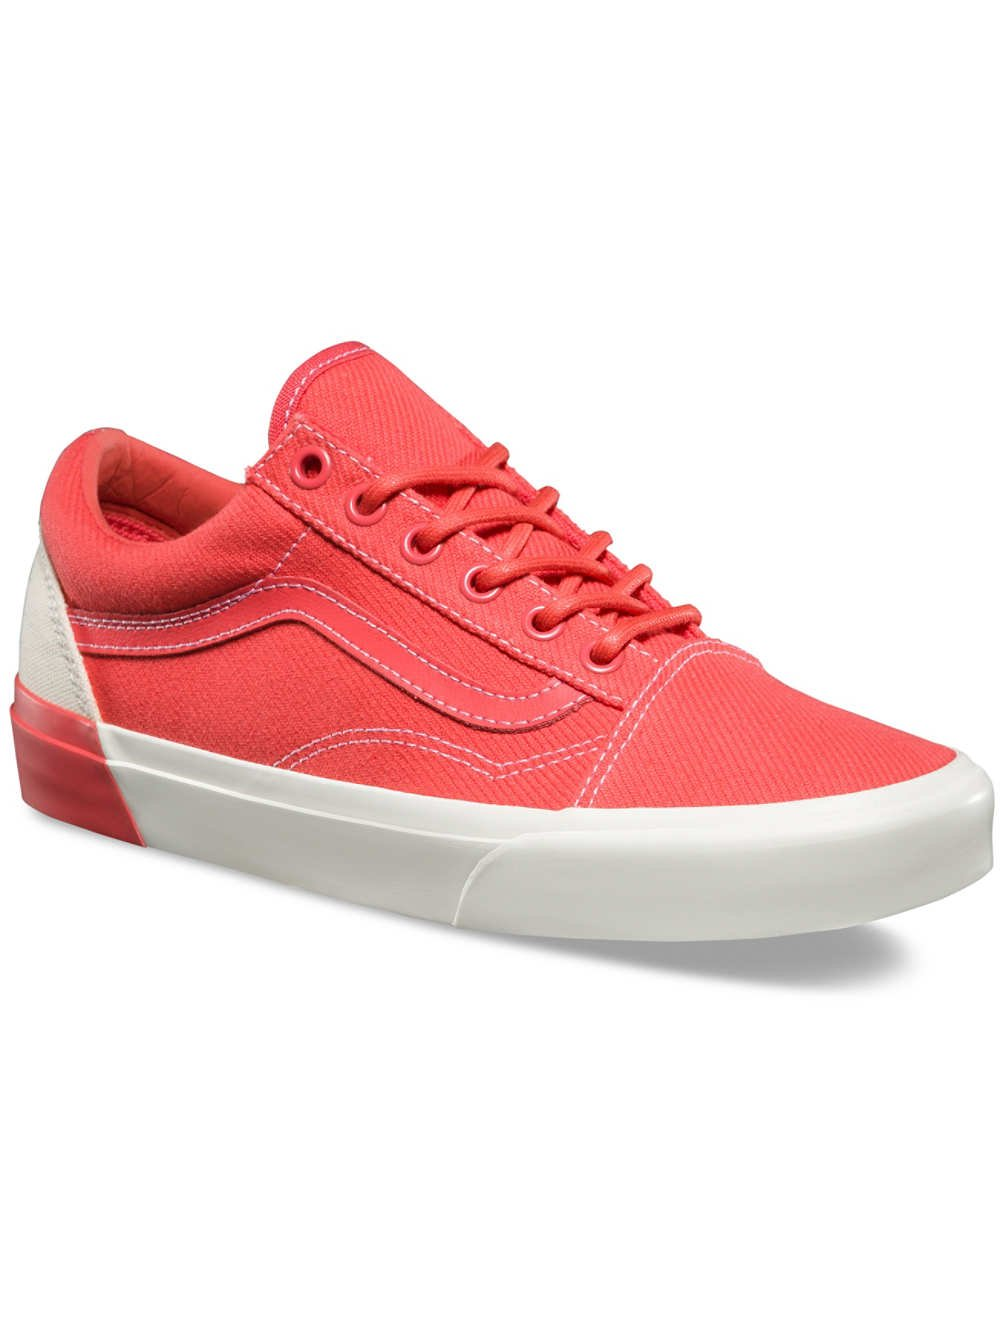 Vans Unisex Old Skool Classic Skate Shoes B06XD34L7P 8 B(M) US|Multicolored